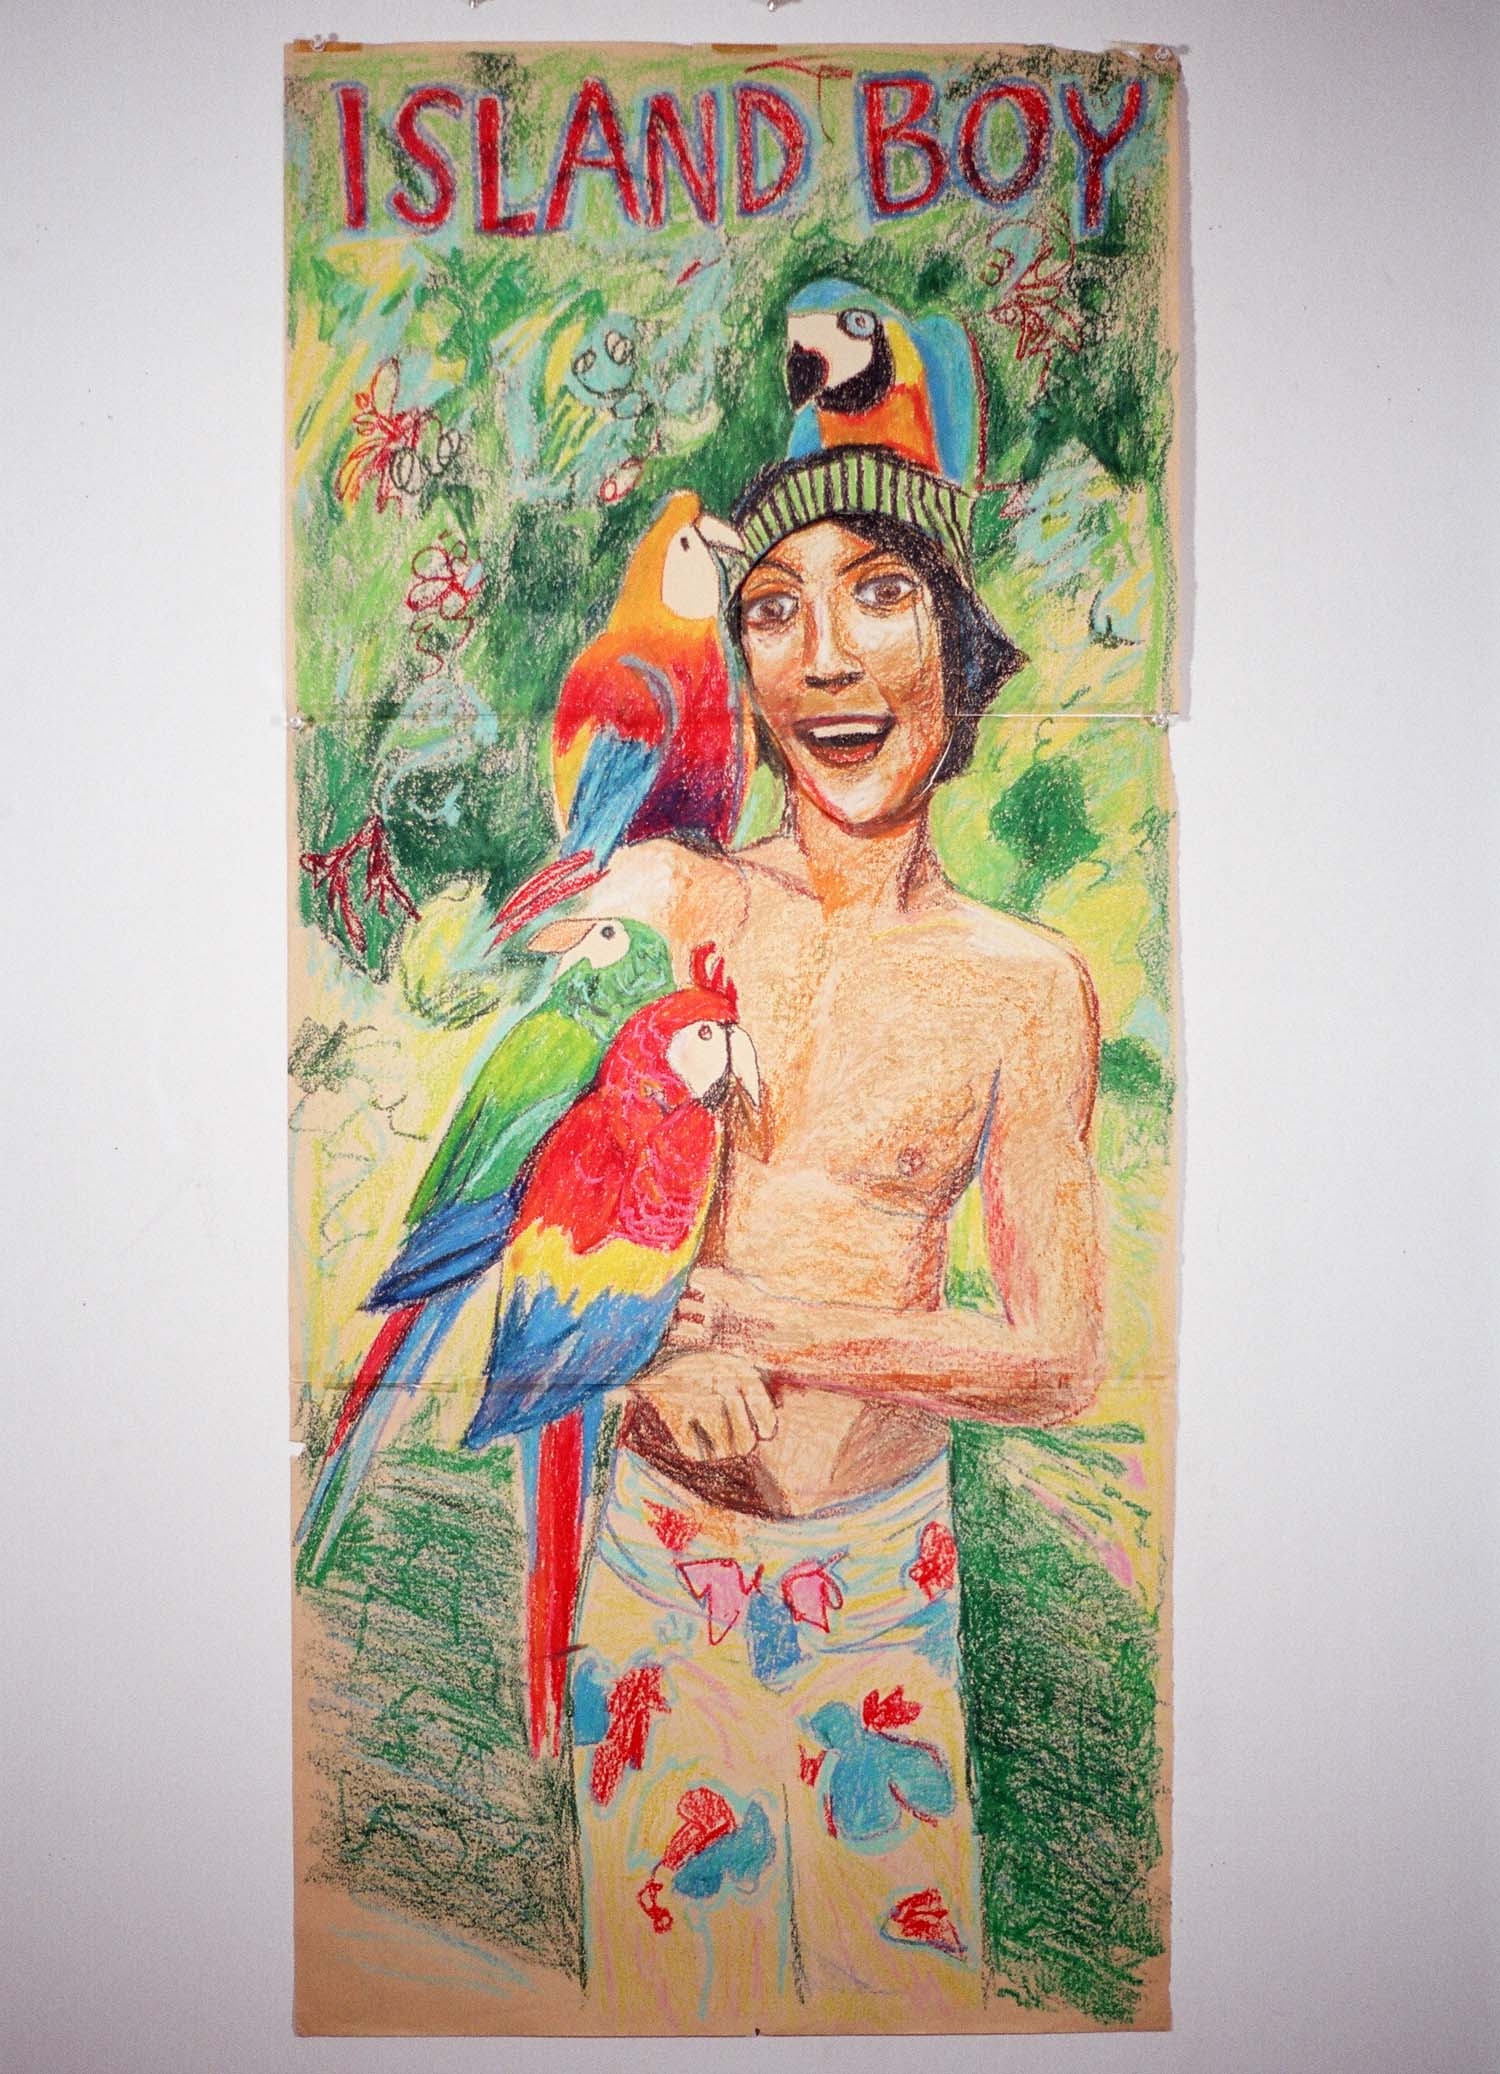 Island Boy , by Walter Robinson, crayon on paper